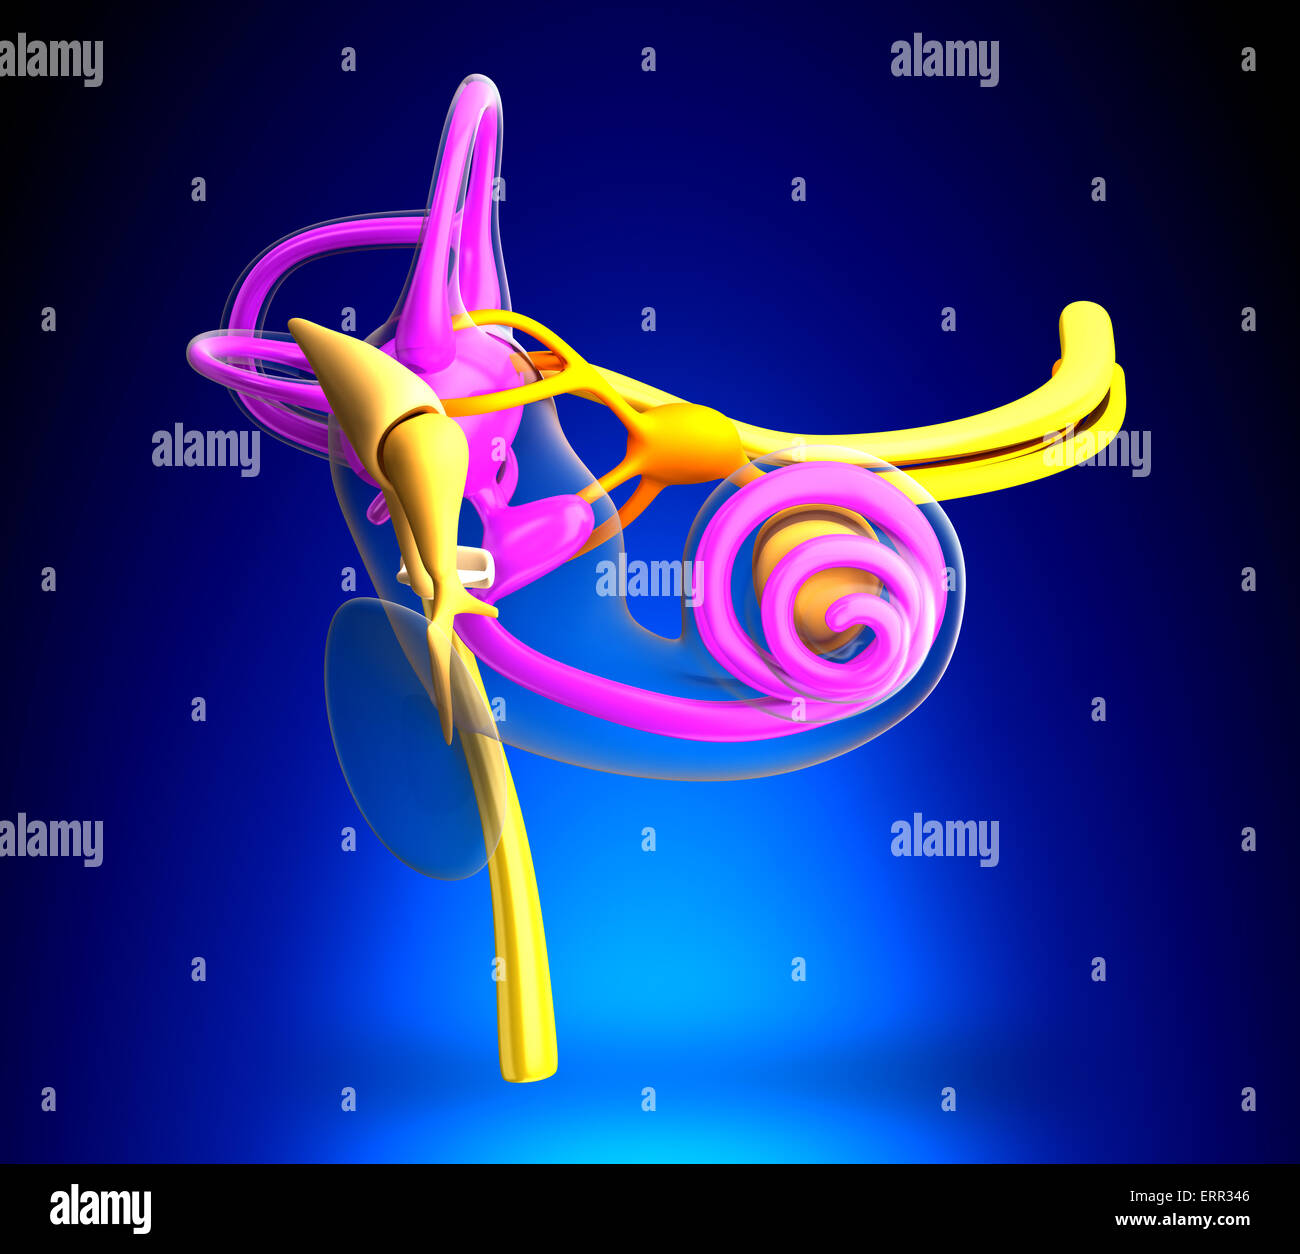 Inner Ear Anatomy on blue background Stock Photo: 83485926 - Alamy